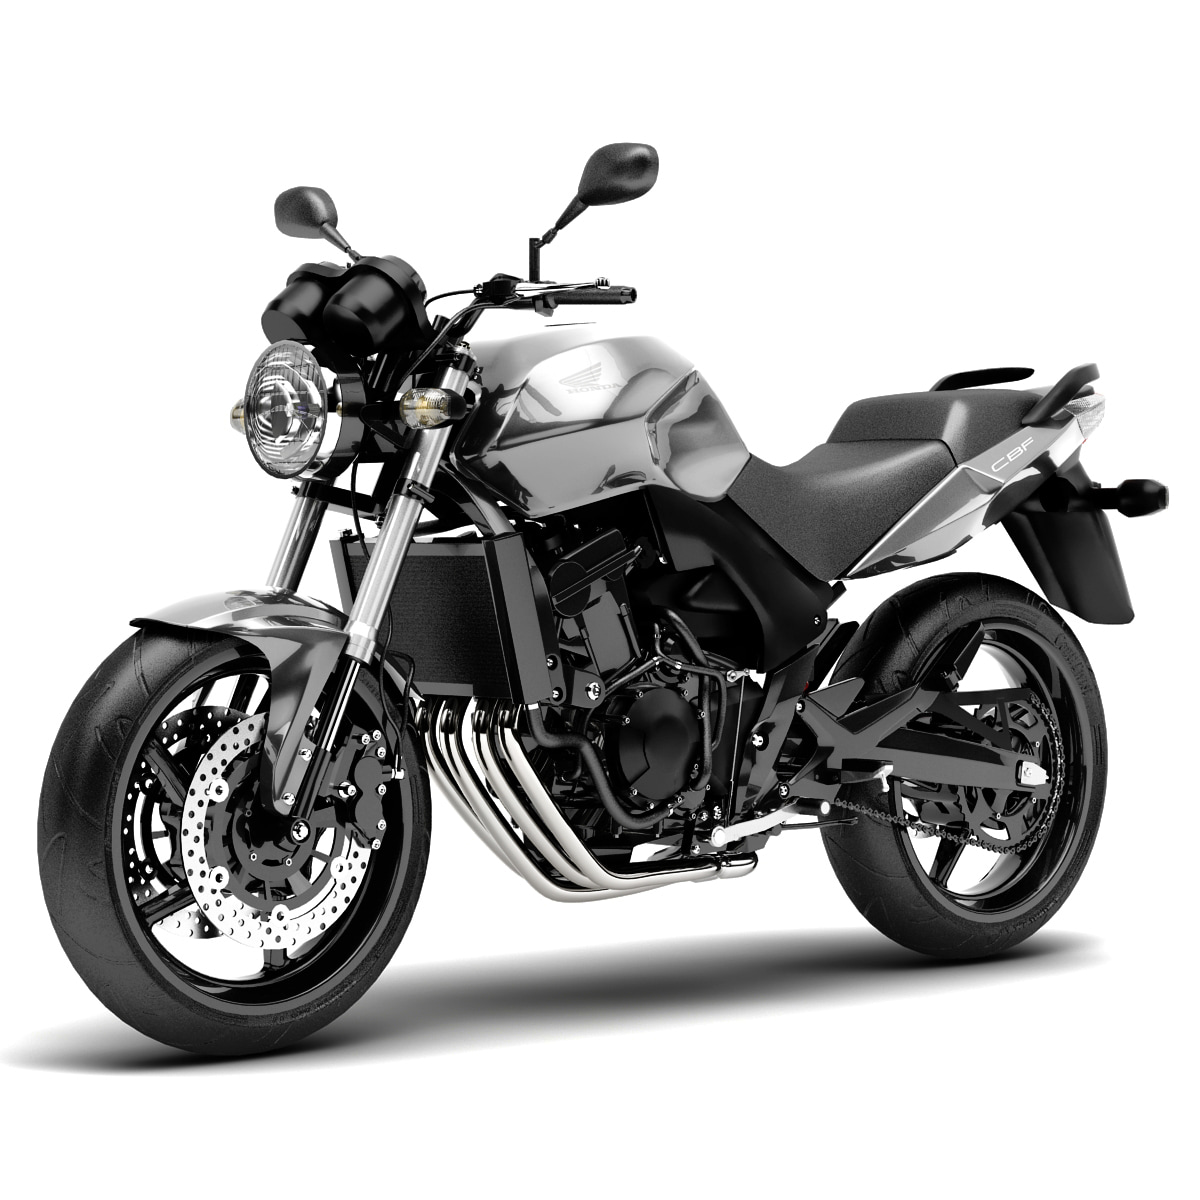 lwo motorcycle honda cbf 600. Black Bedroom Furniture Sets. Home Design Ideas